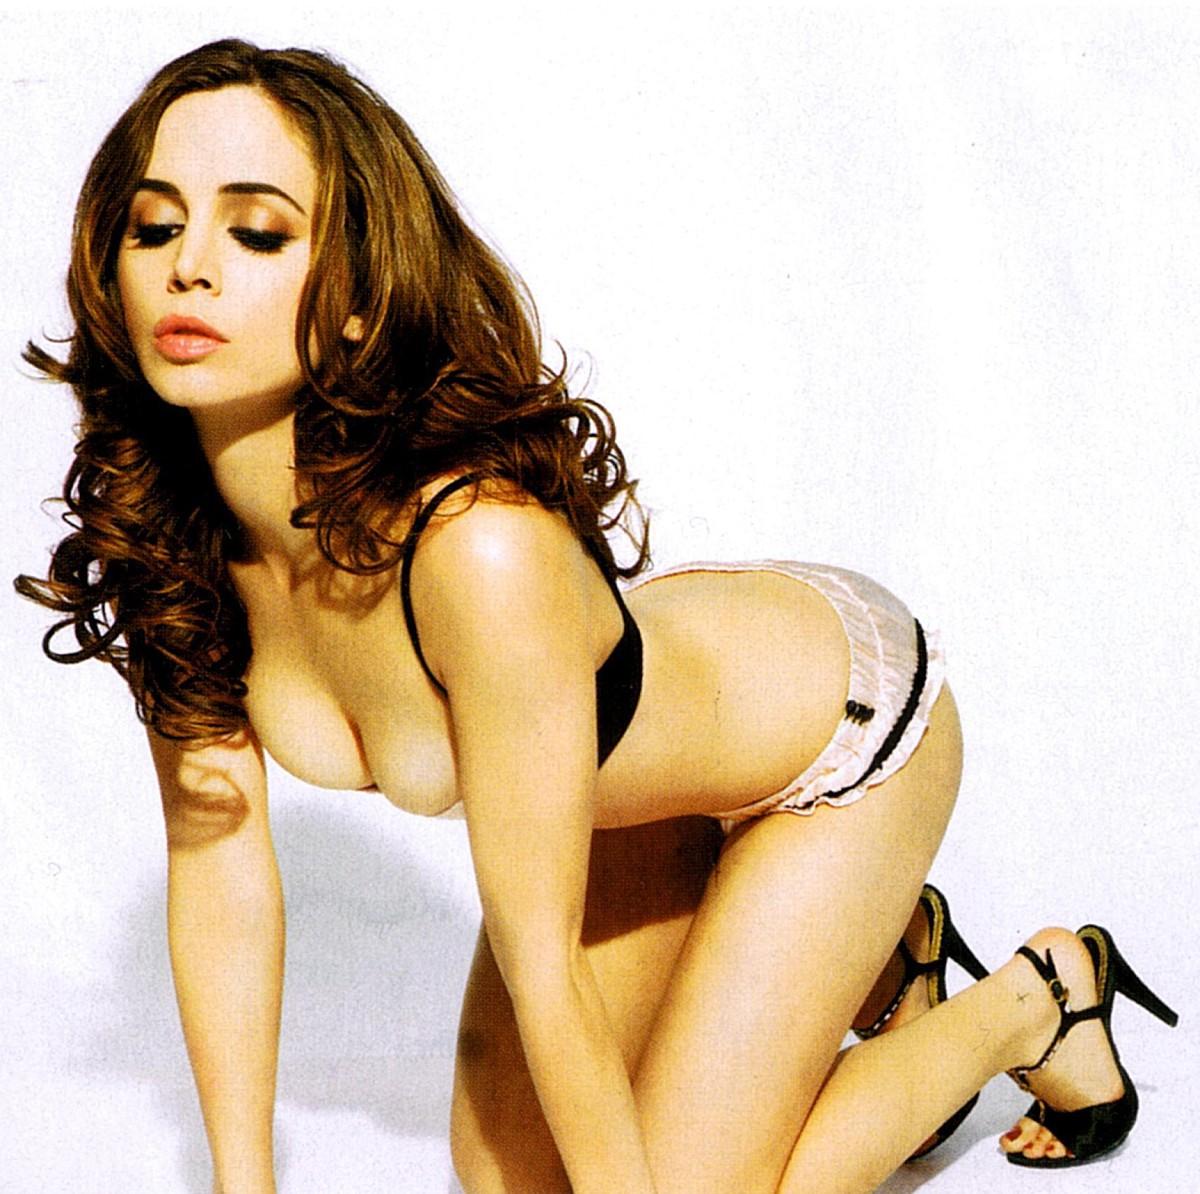 http://3.bp.blogspot.com/-3mOQ76JQLNg/TgU60gWZH1I/AAAAAAAAHCg/C76CUxHbJYM/s1600/eliza-dushku-sexy-celebrity.jpg